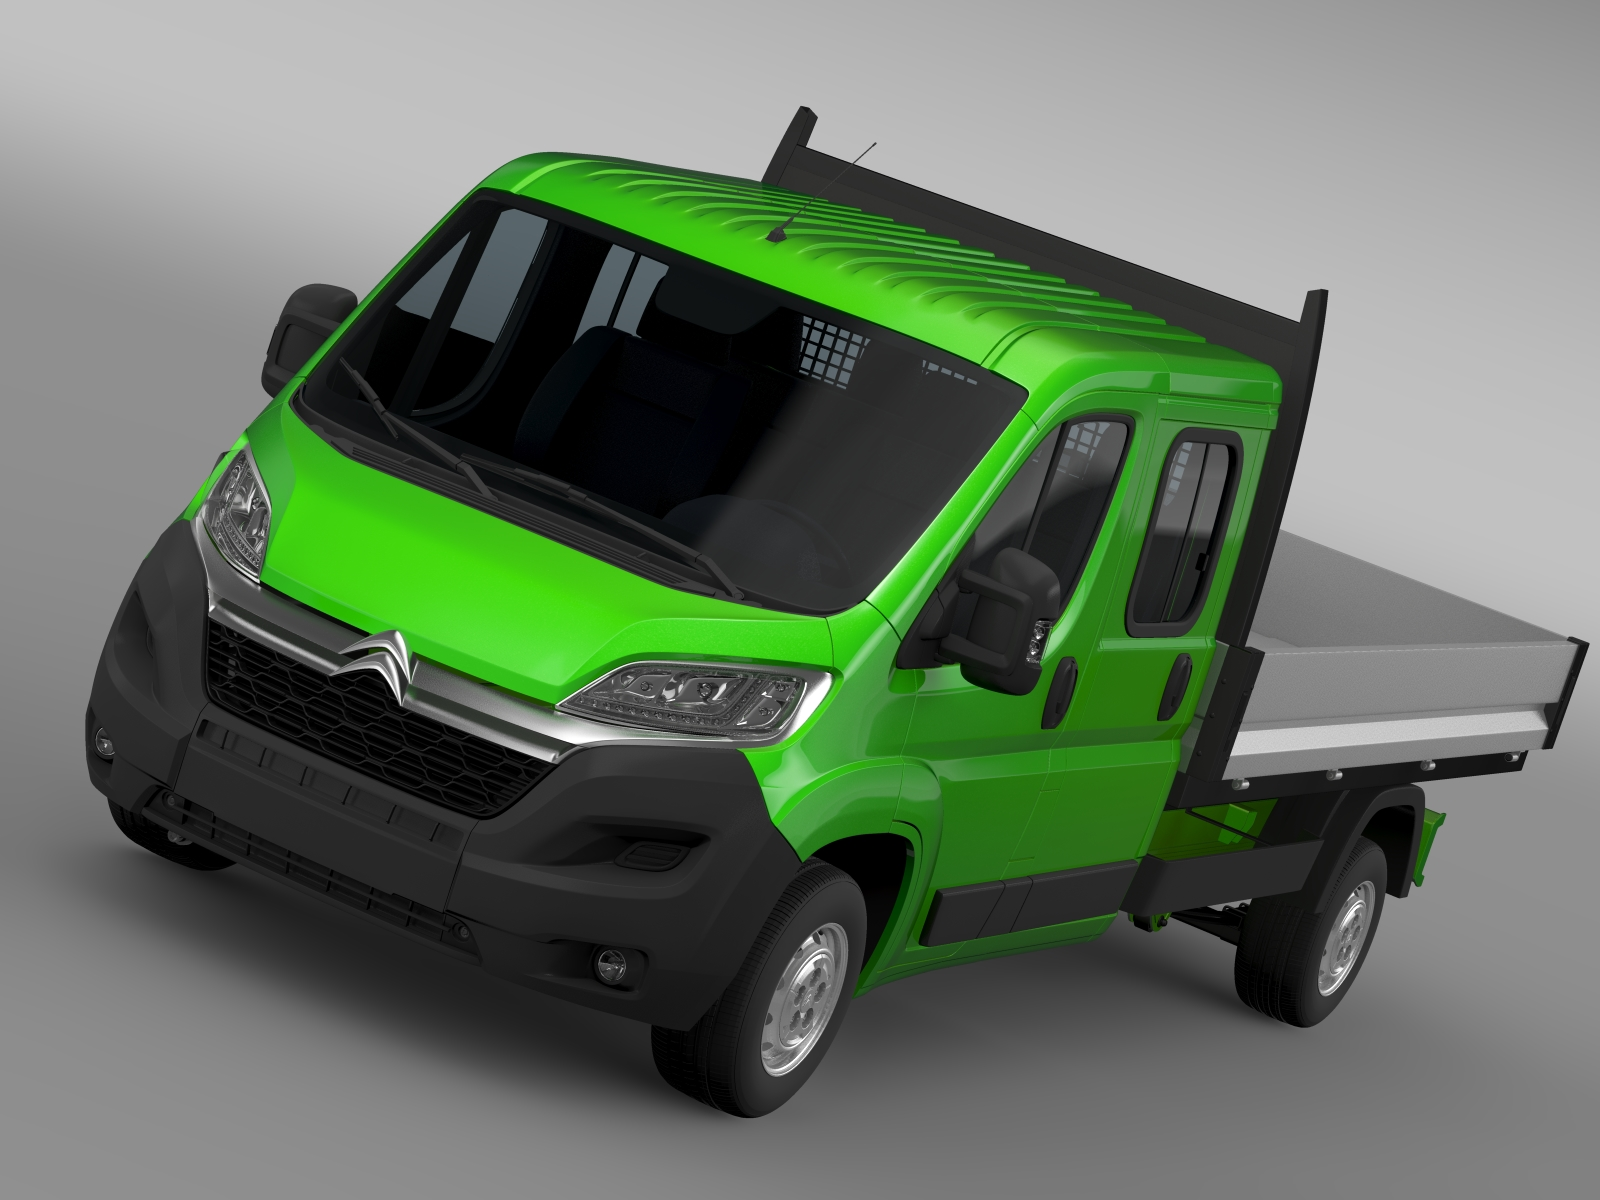 Citroen ریلے عملے کی ٹیک ٹرک 2016 3D ماڈل 3ds زیادہ سے زیادہ FBX C4D دو MA MBC XSI obj 218702